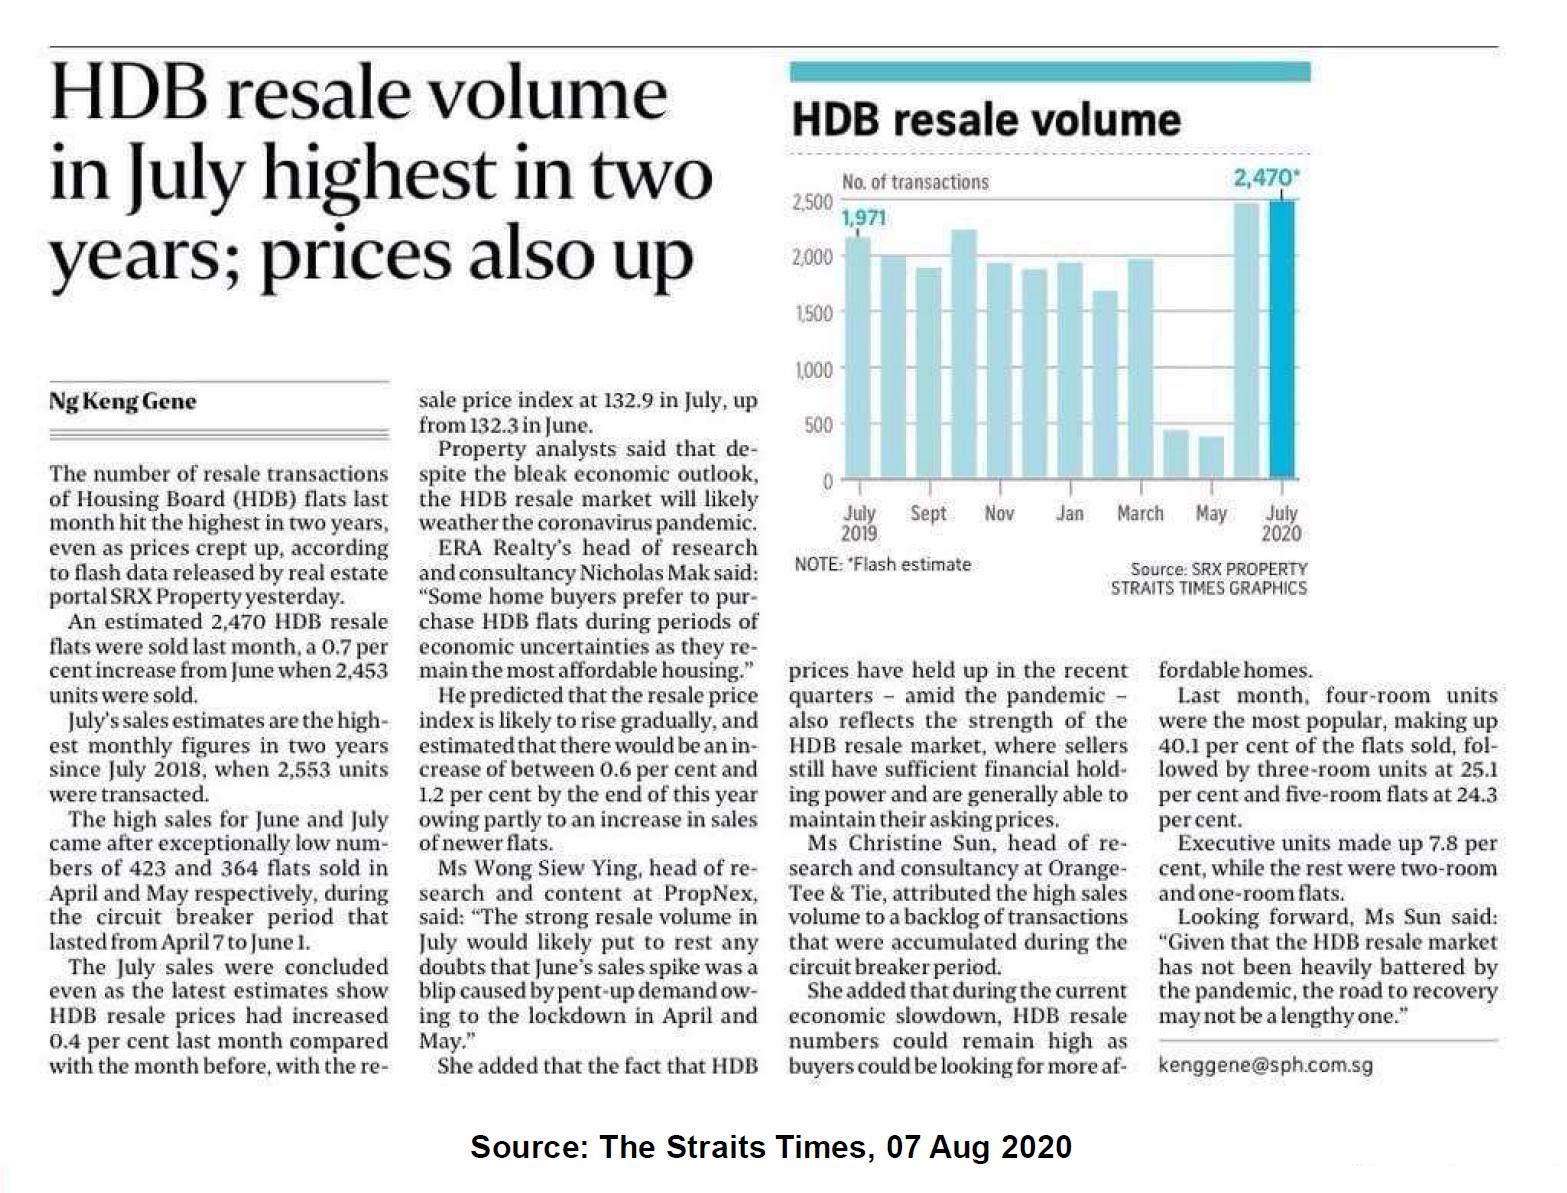 HDB Resale Volume Up